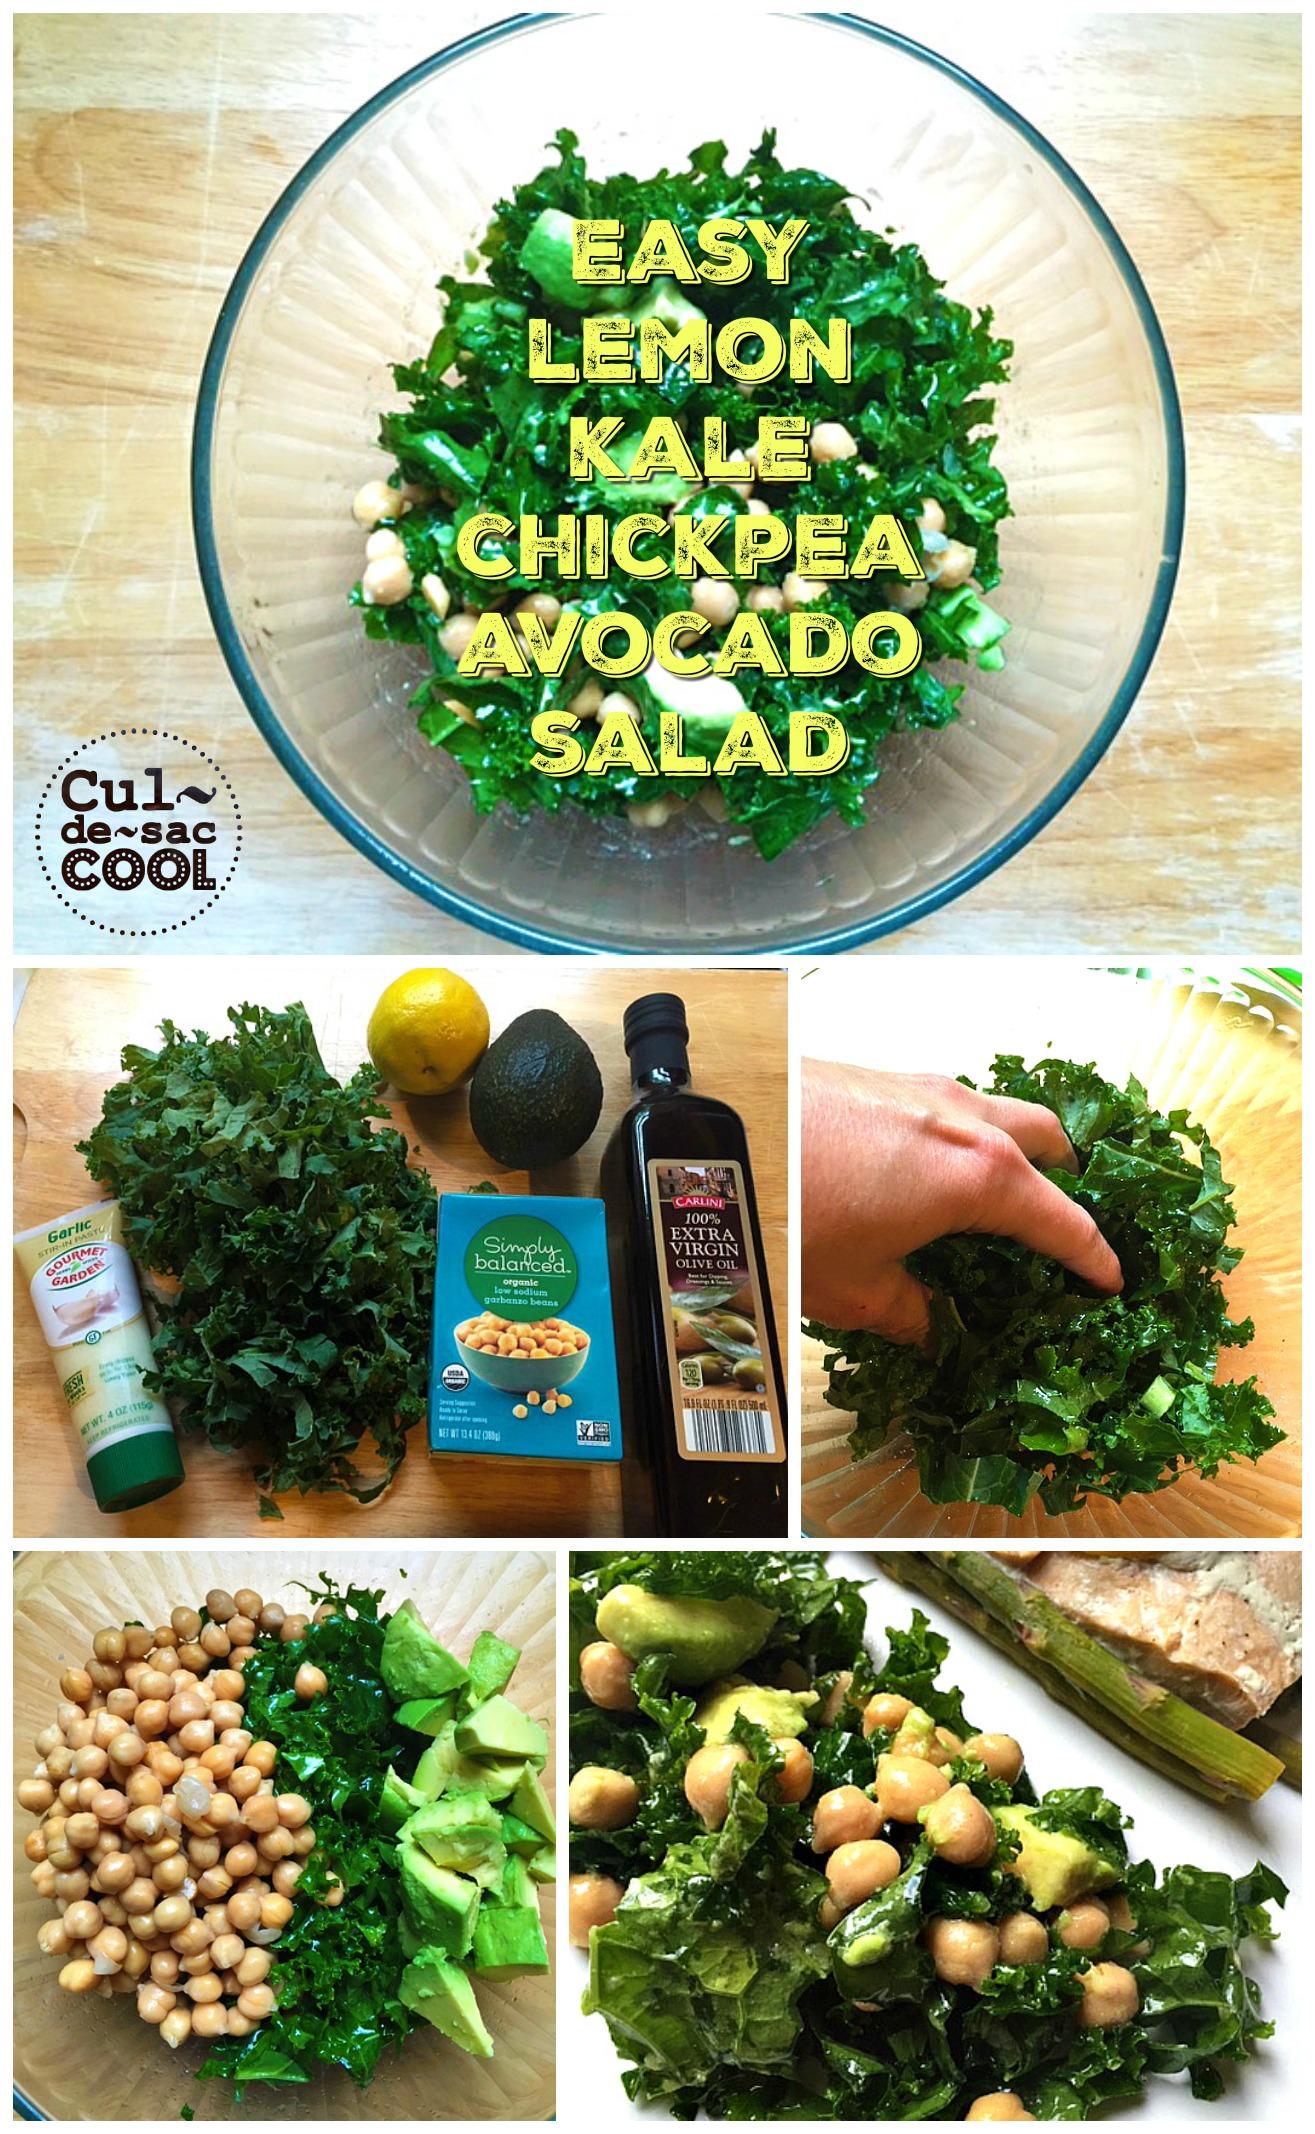 Easy Lemon Kale Chickpea Avocado Salad Collage